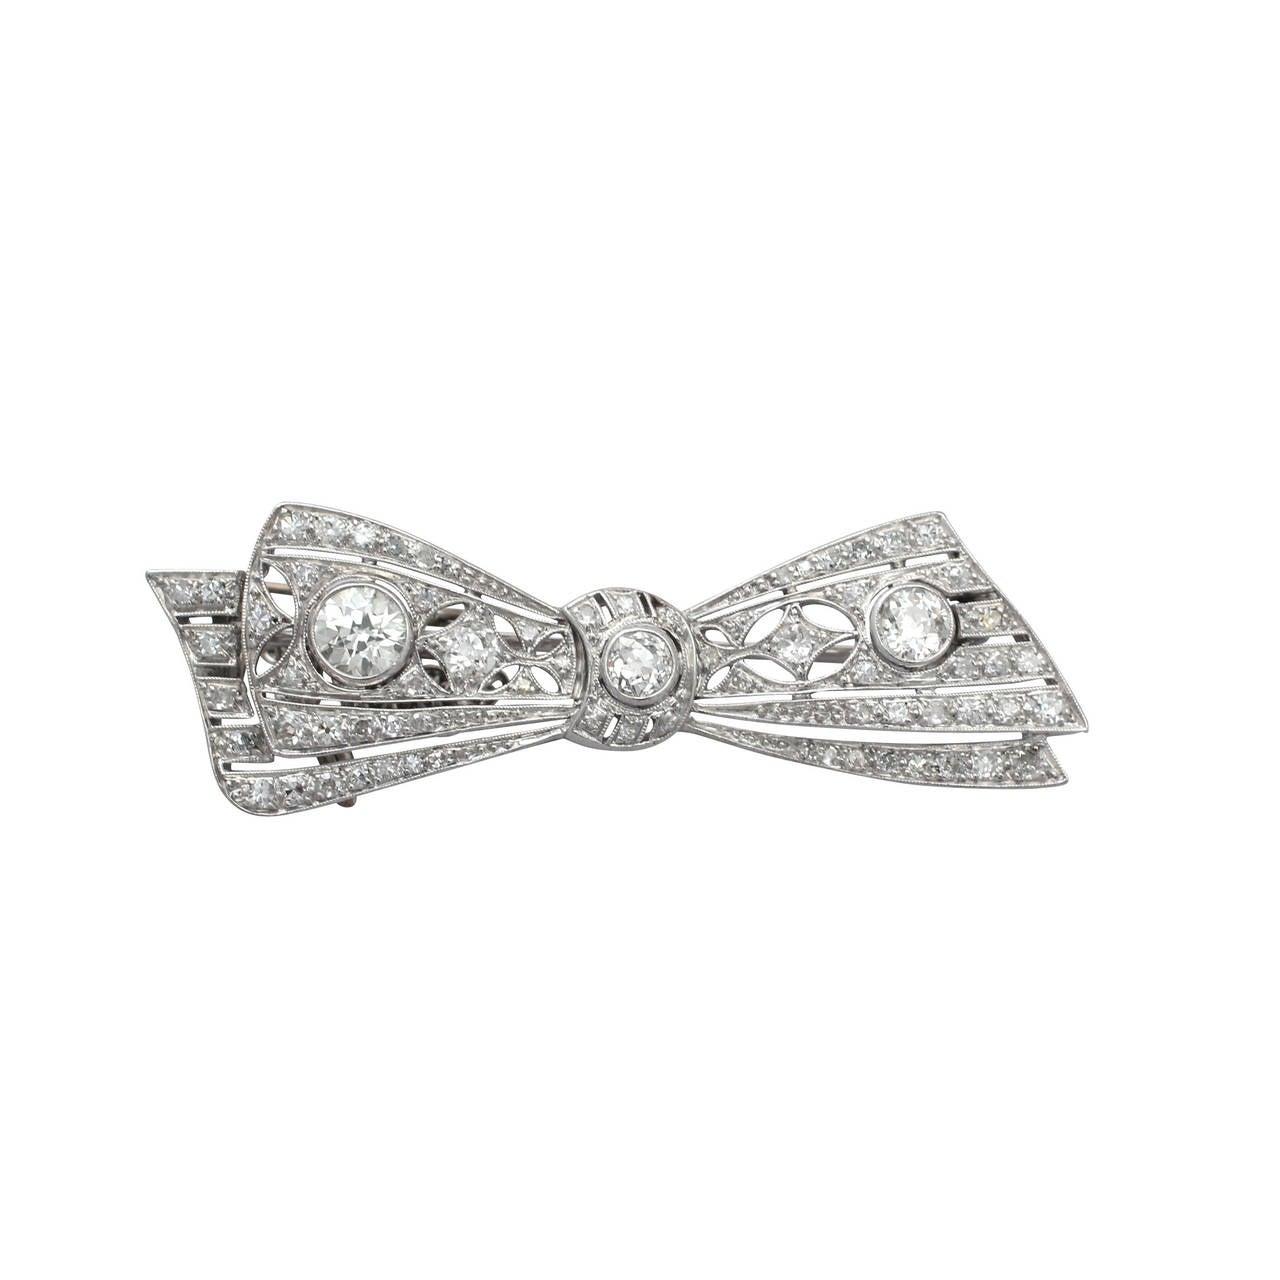 2.55Ct Diamond, 18k White Gold Bow Brooch - Antique Circa 1900